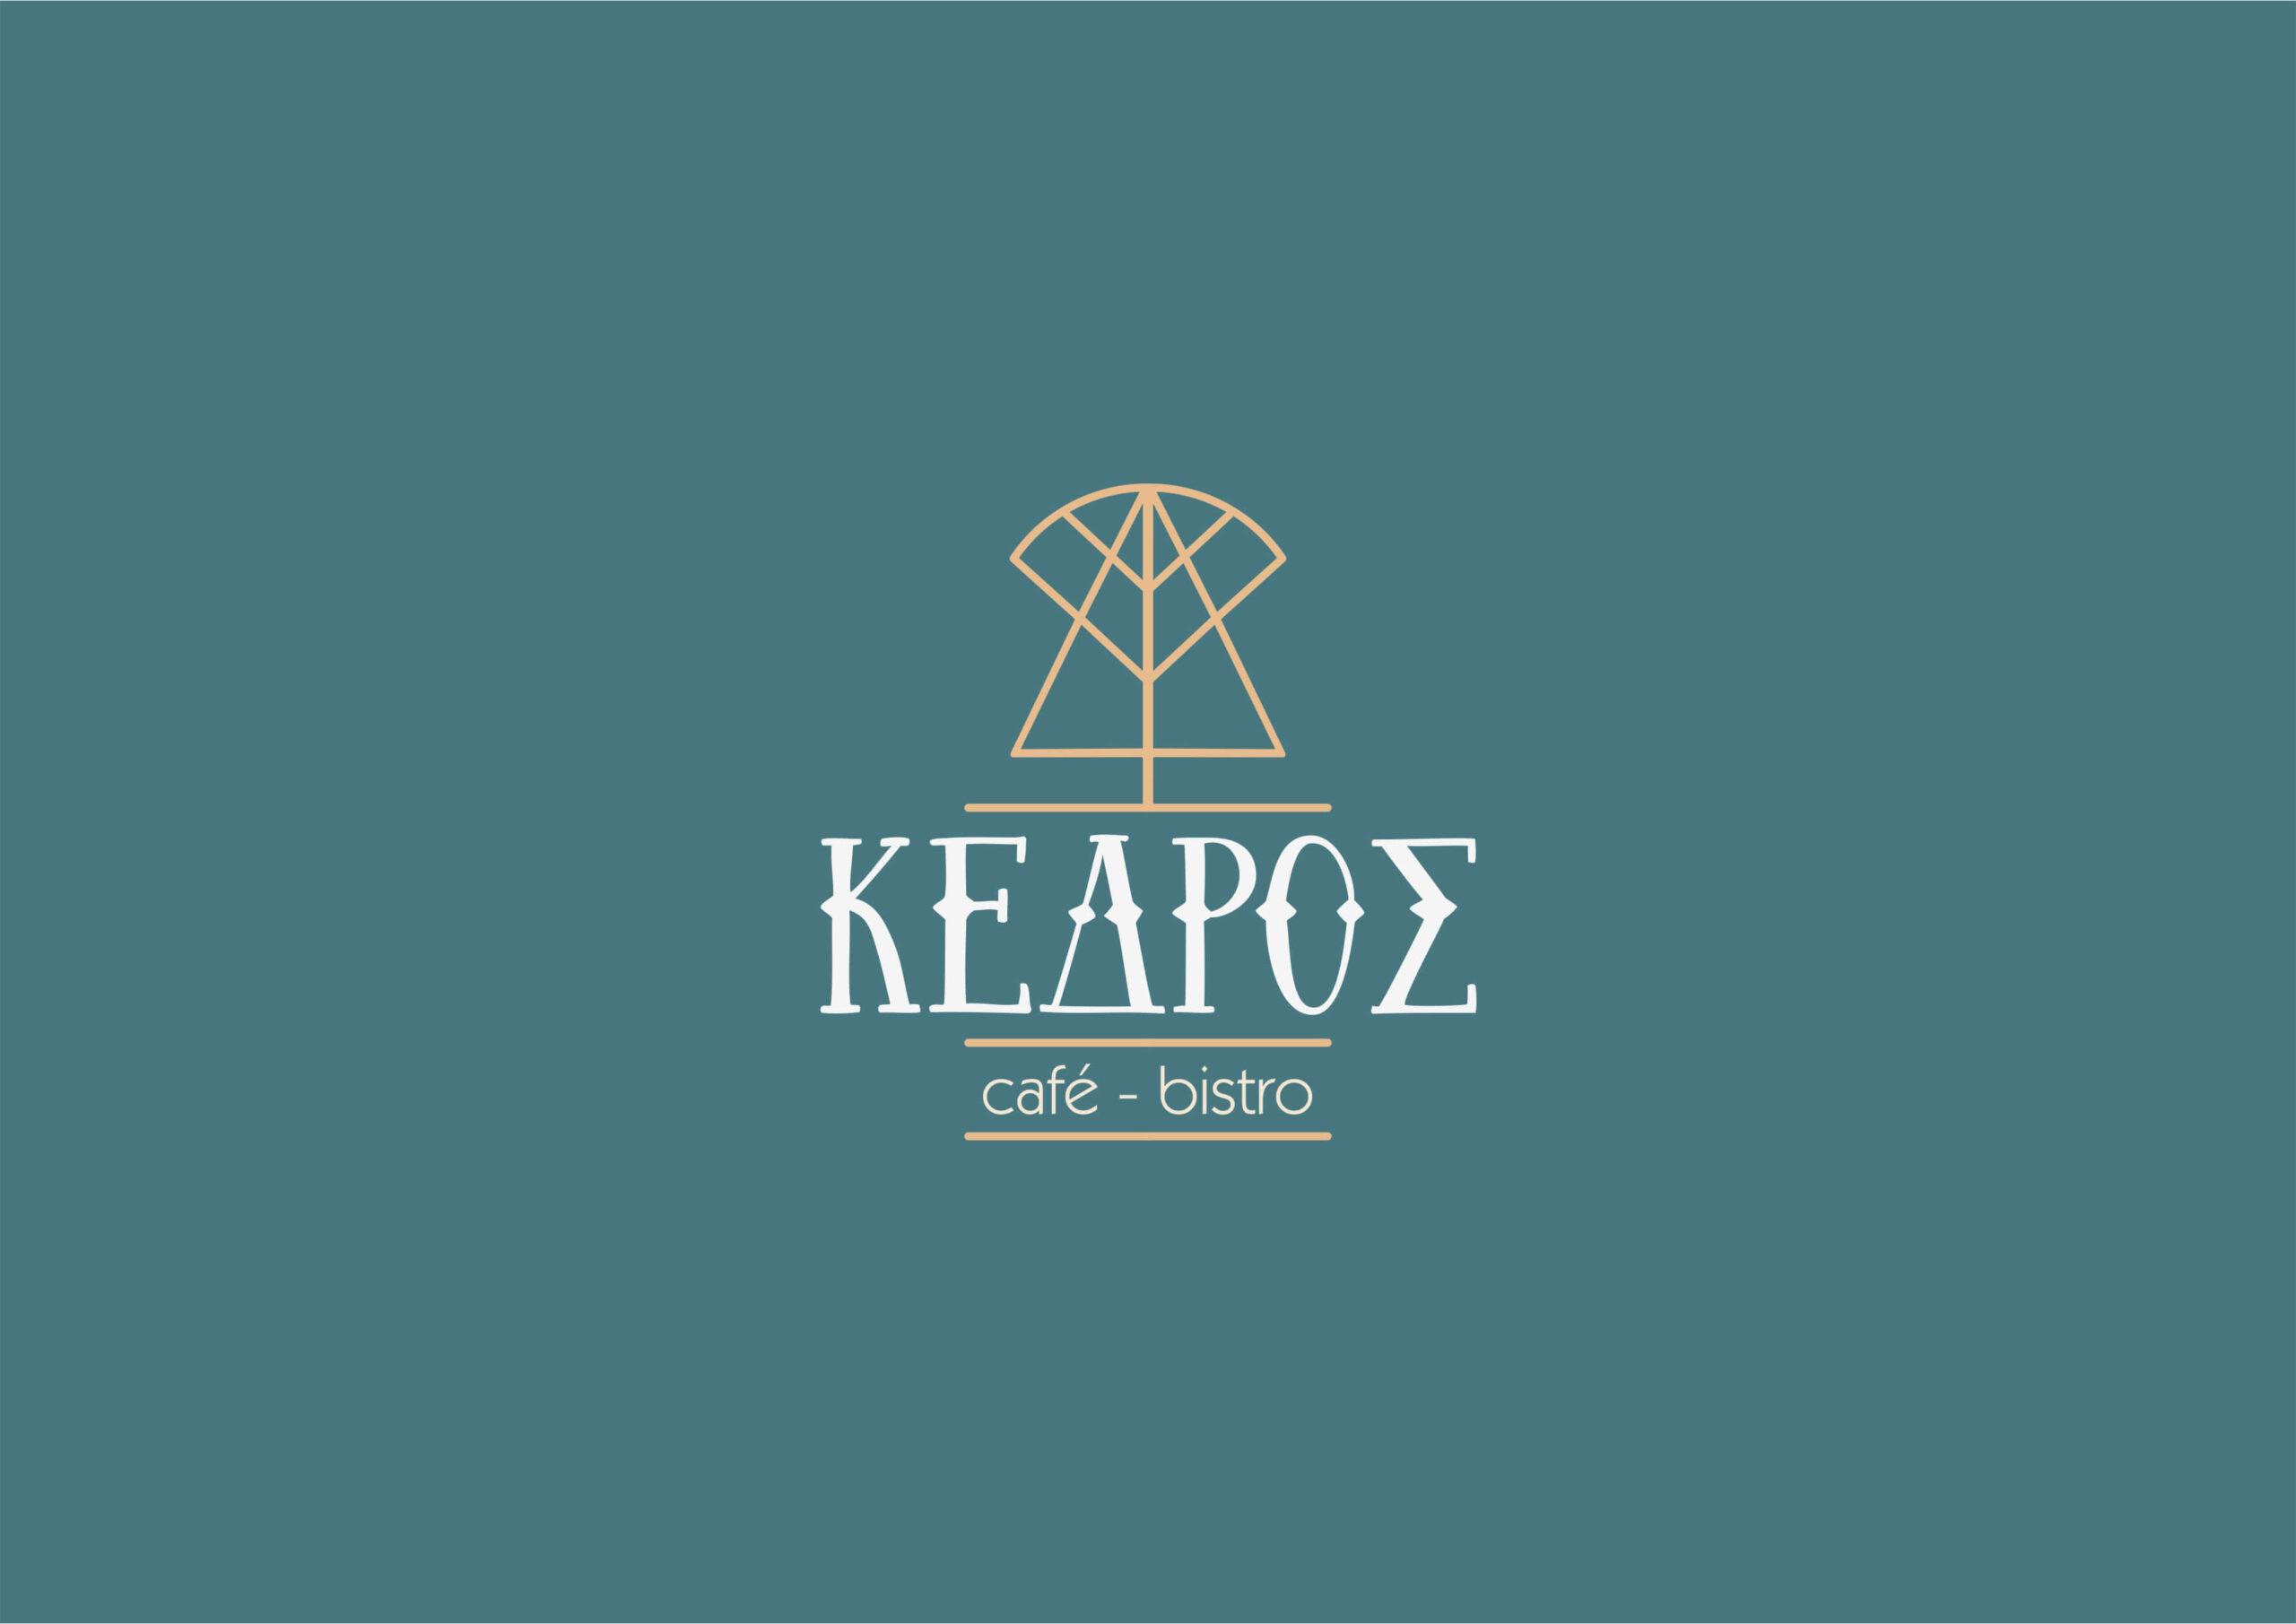 KEDROS - LOGO